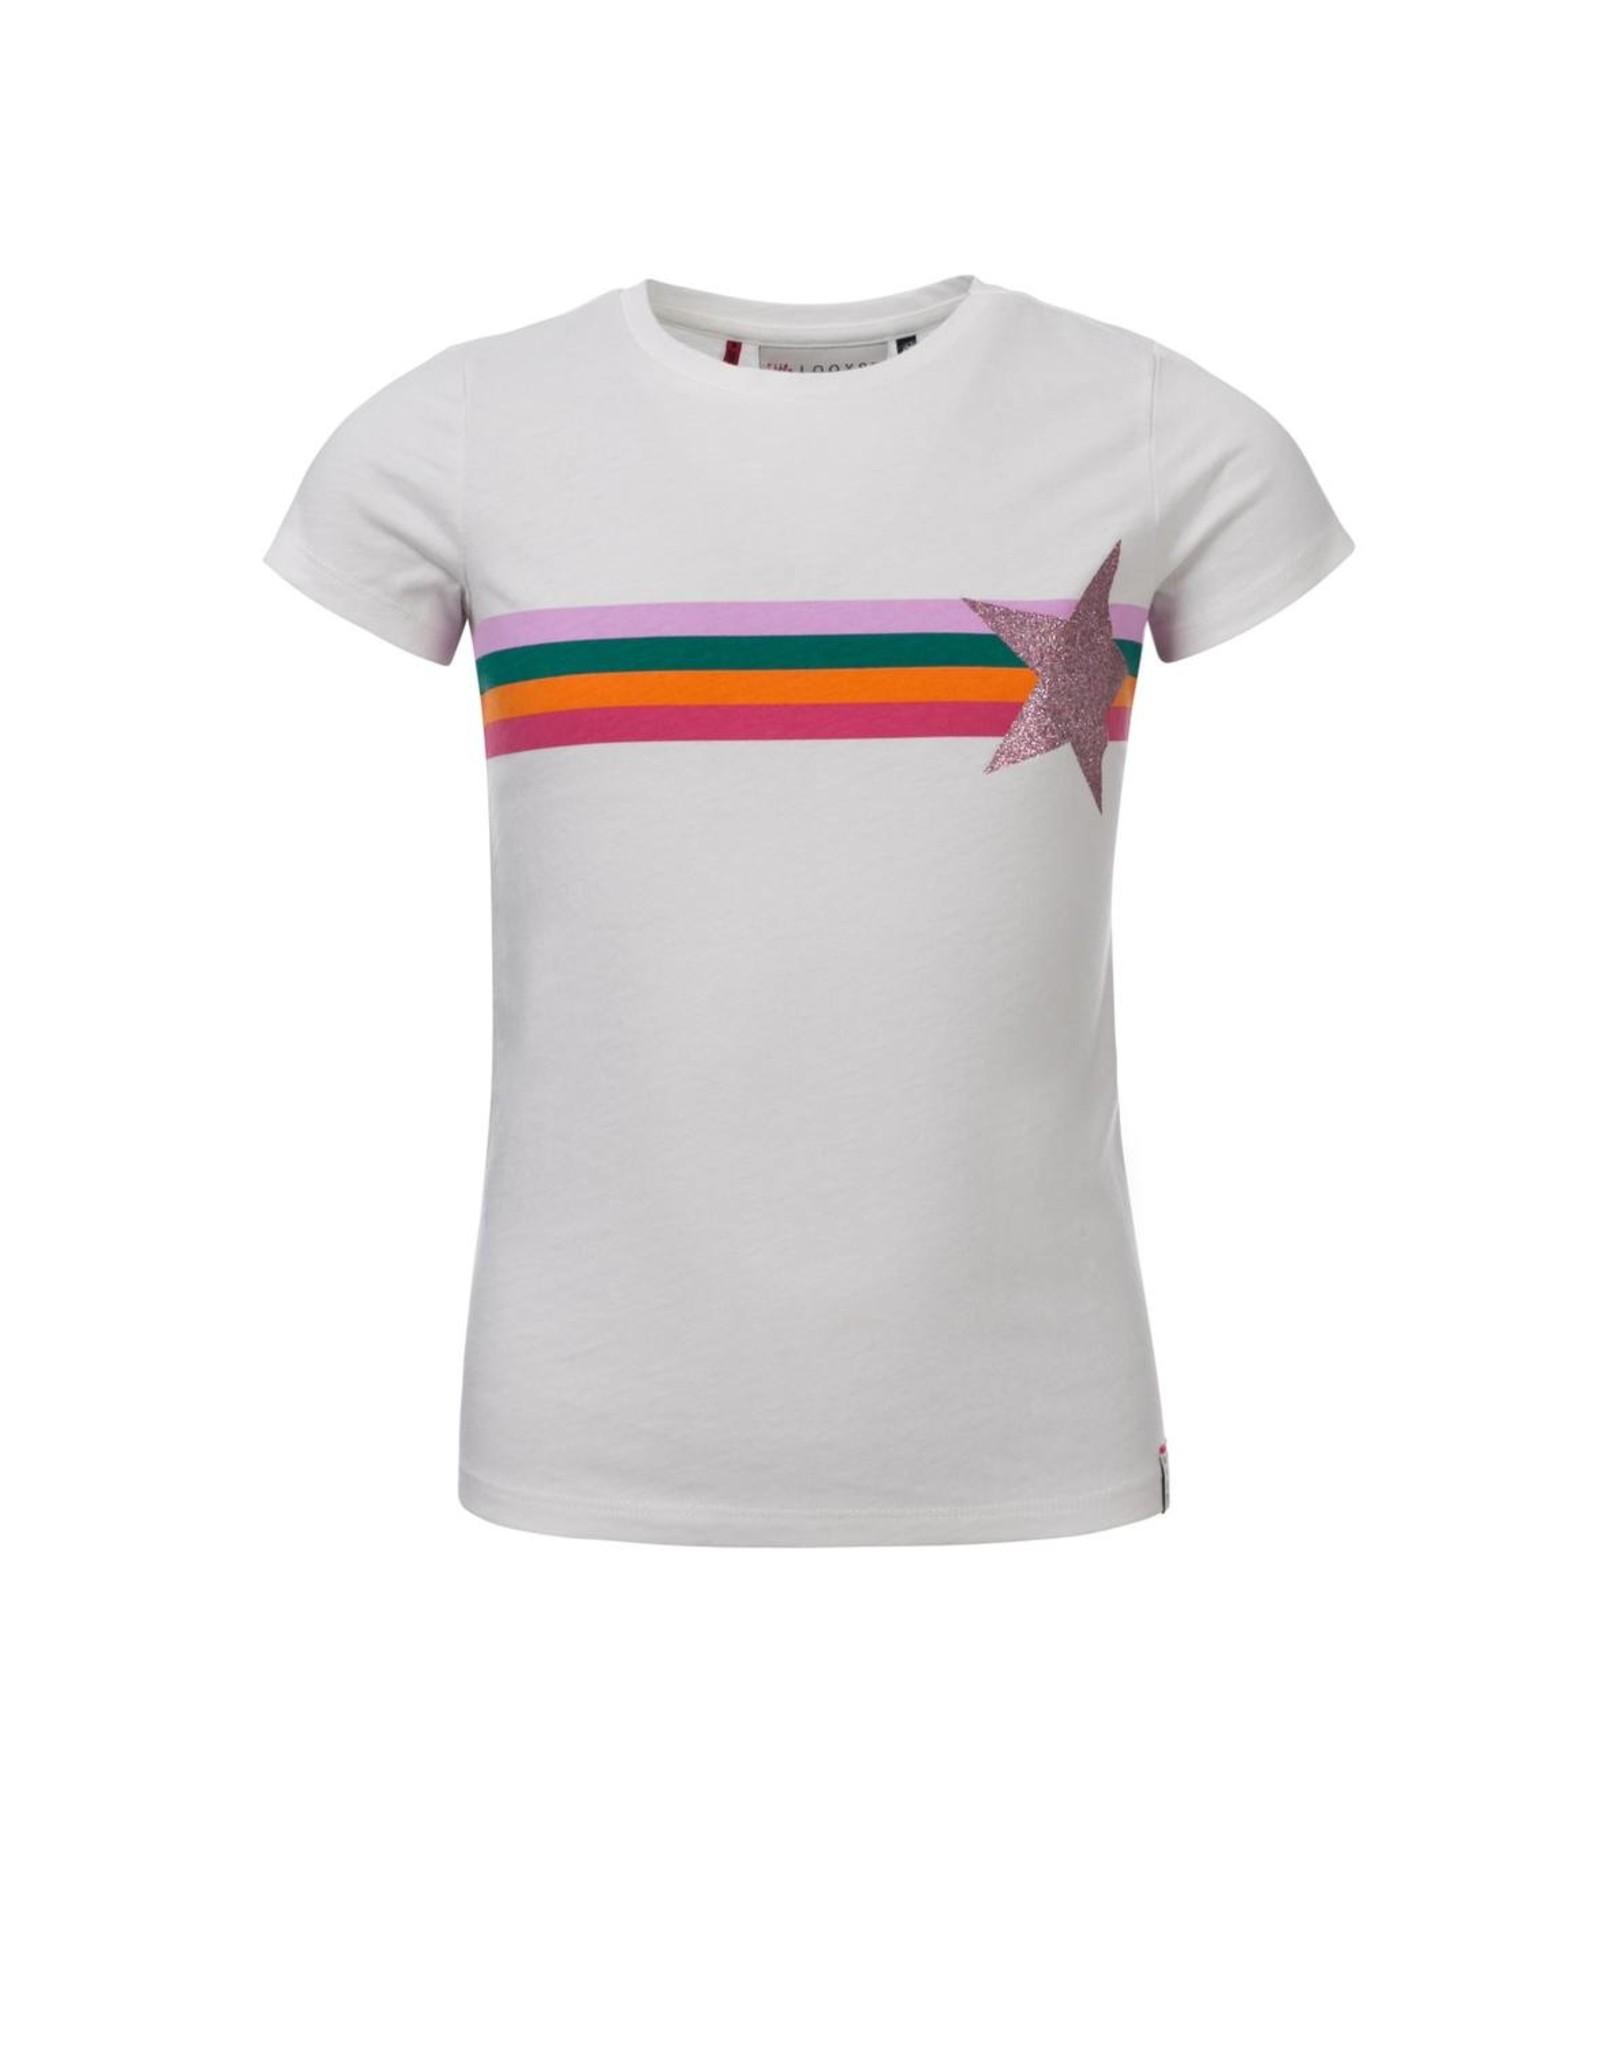 Looxs Revolution Little t-shirt s. Sleeve